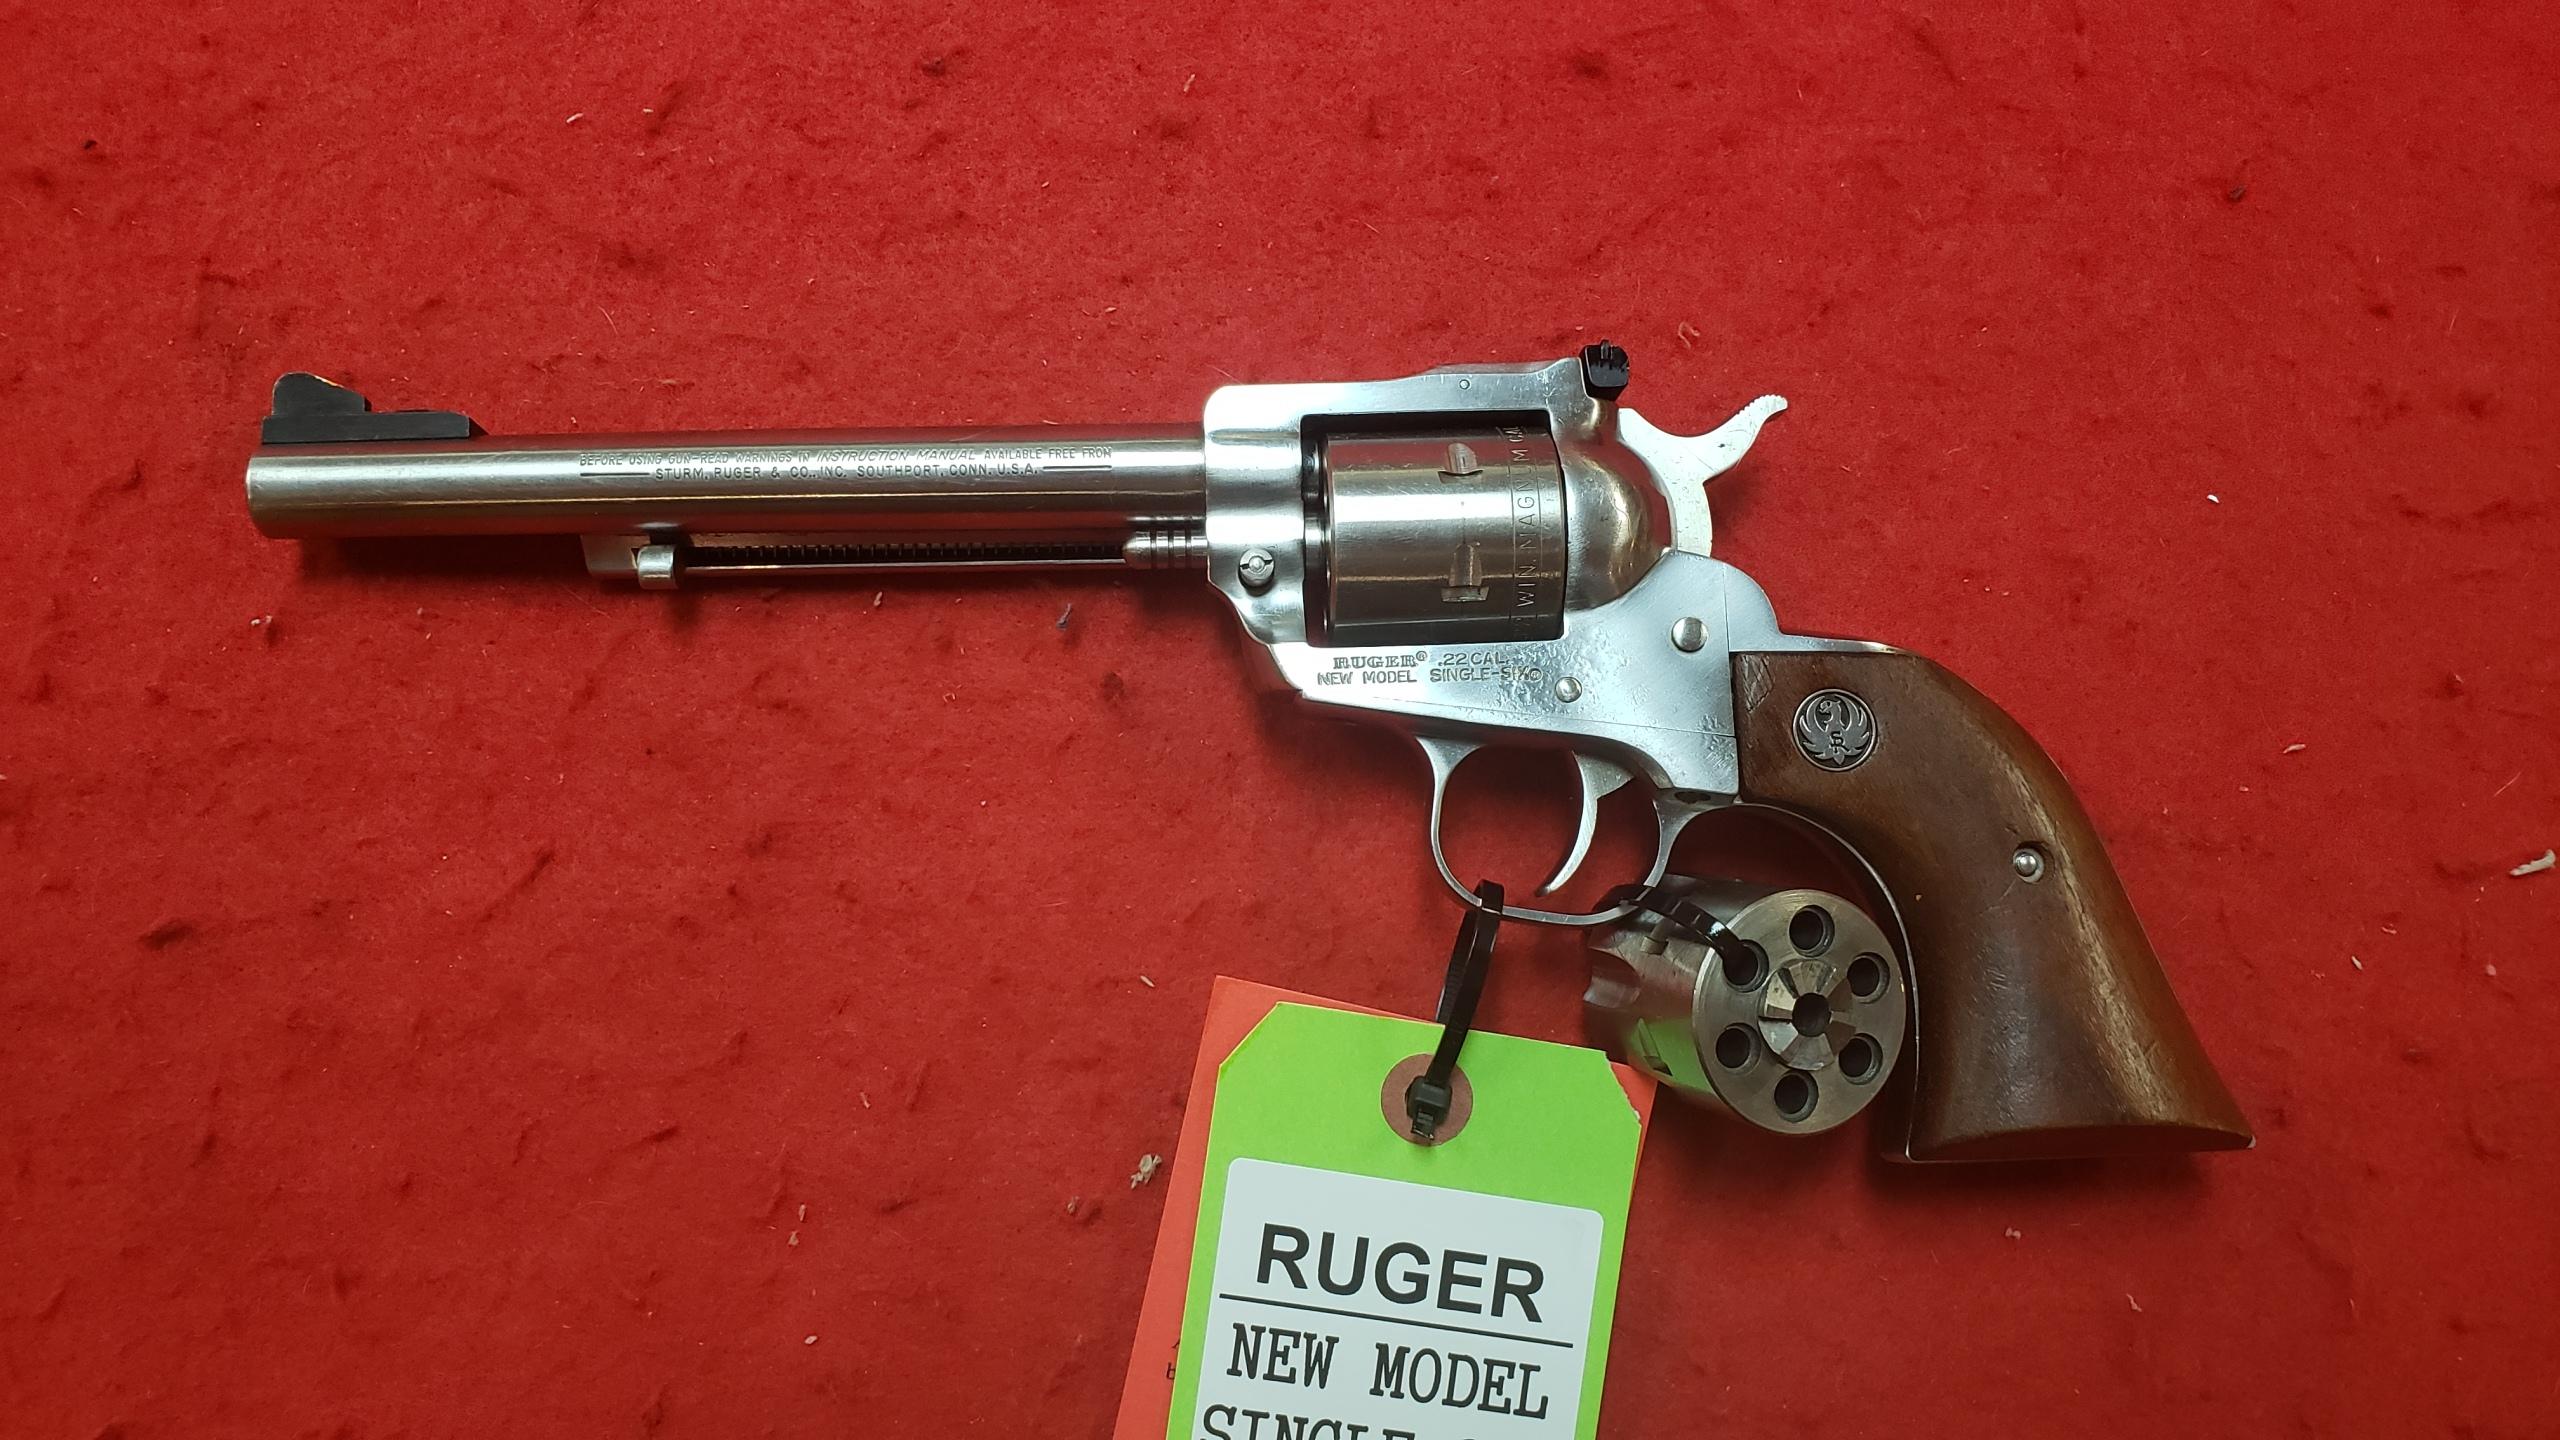 RUGER - NEW MODEL SINGLE-SIX - REVOLVER FIREARM-img-2